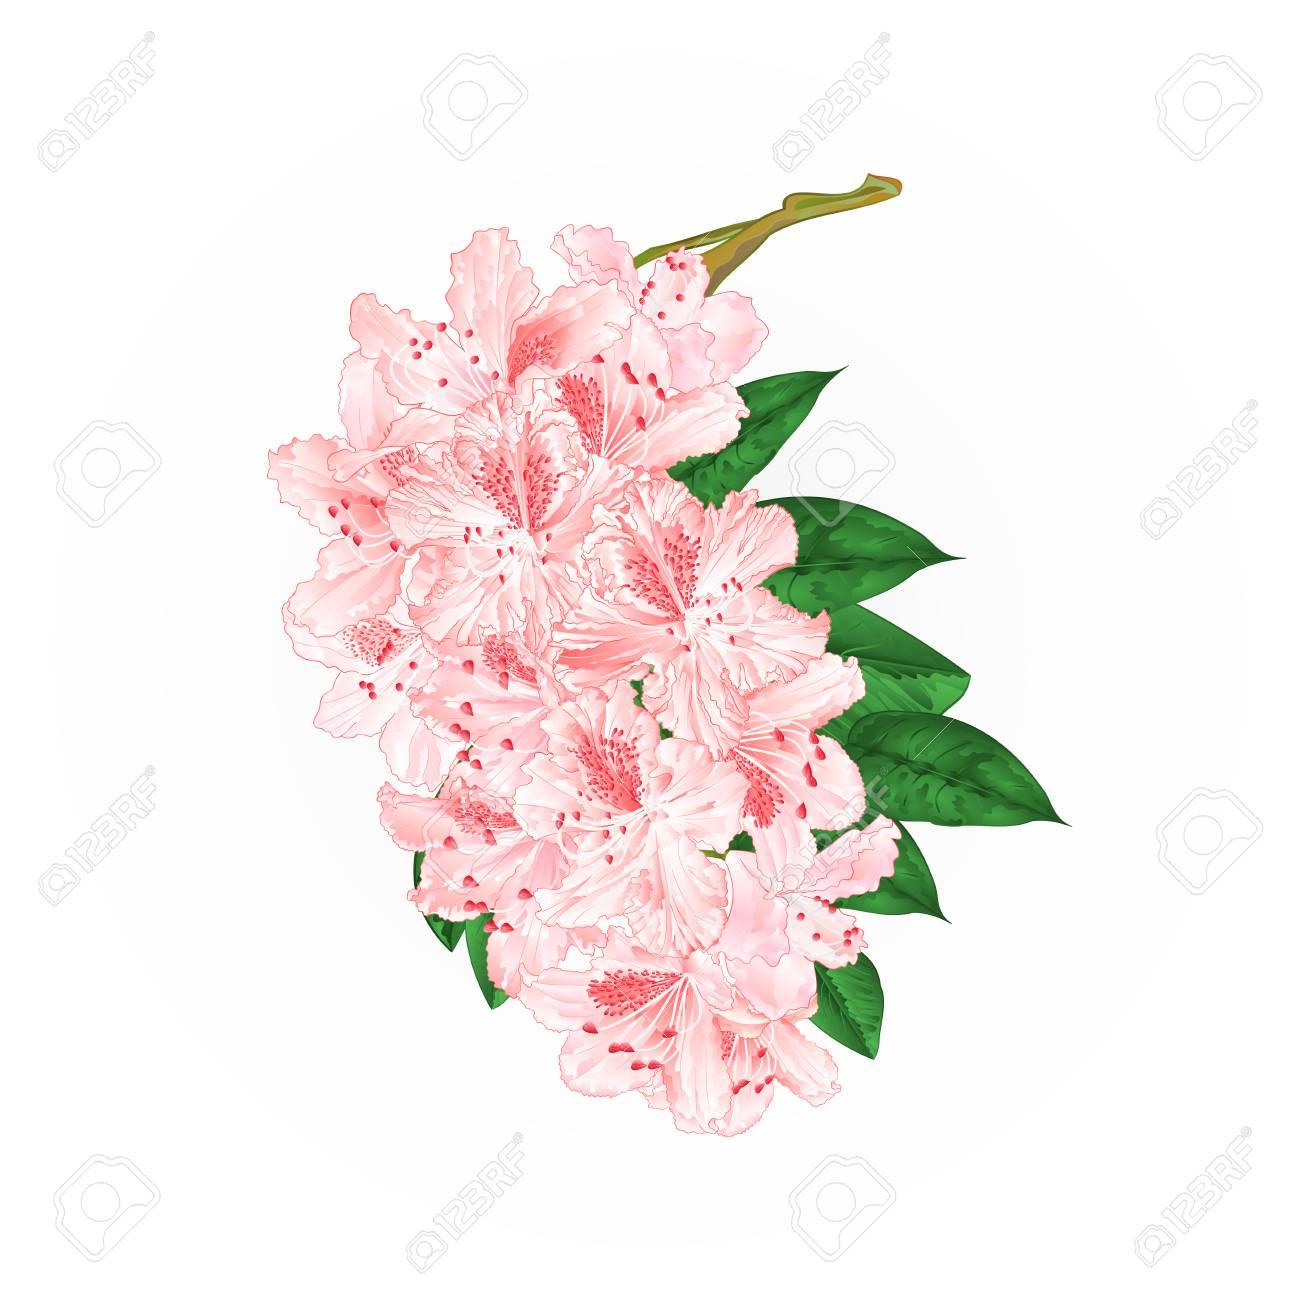 Branch Light Pink Flowers Stock Photography Illustration Royalty